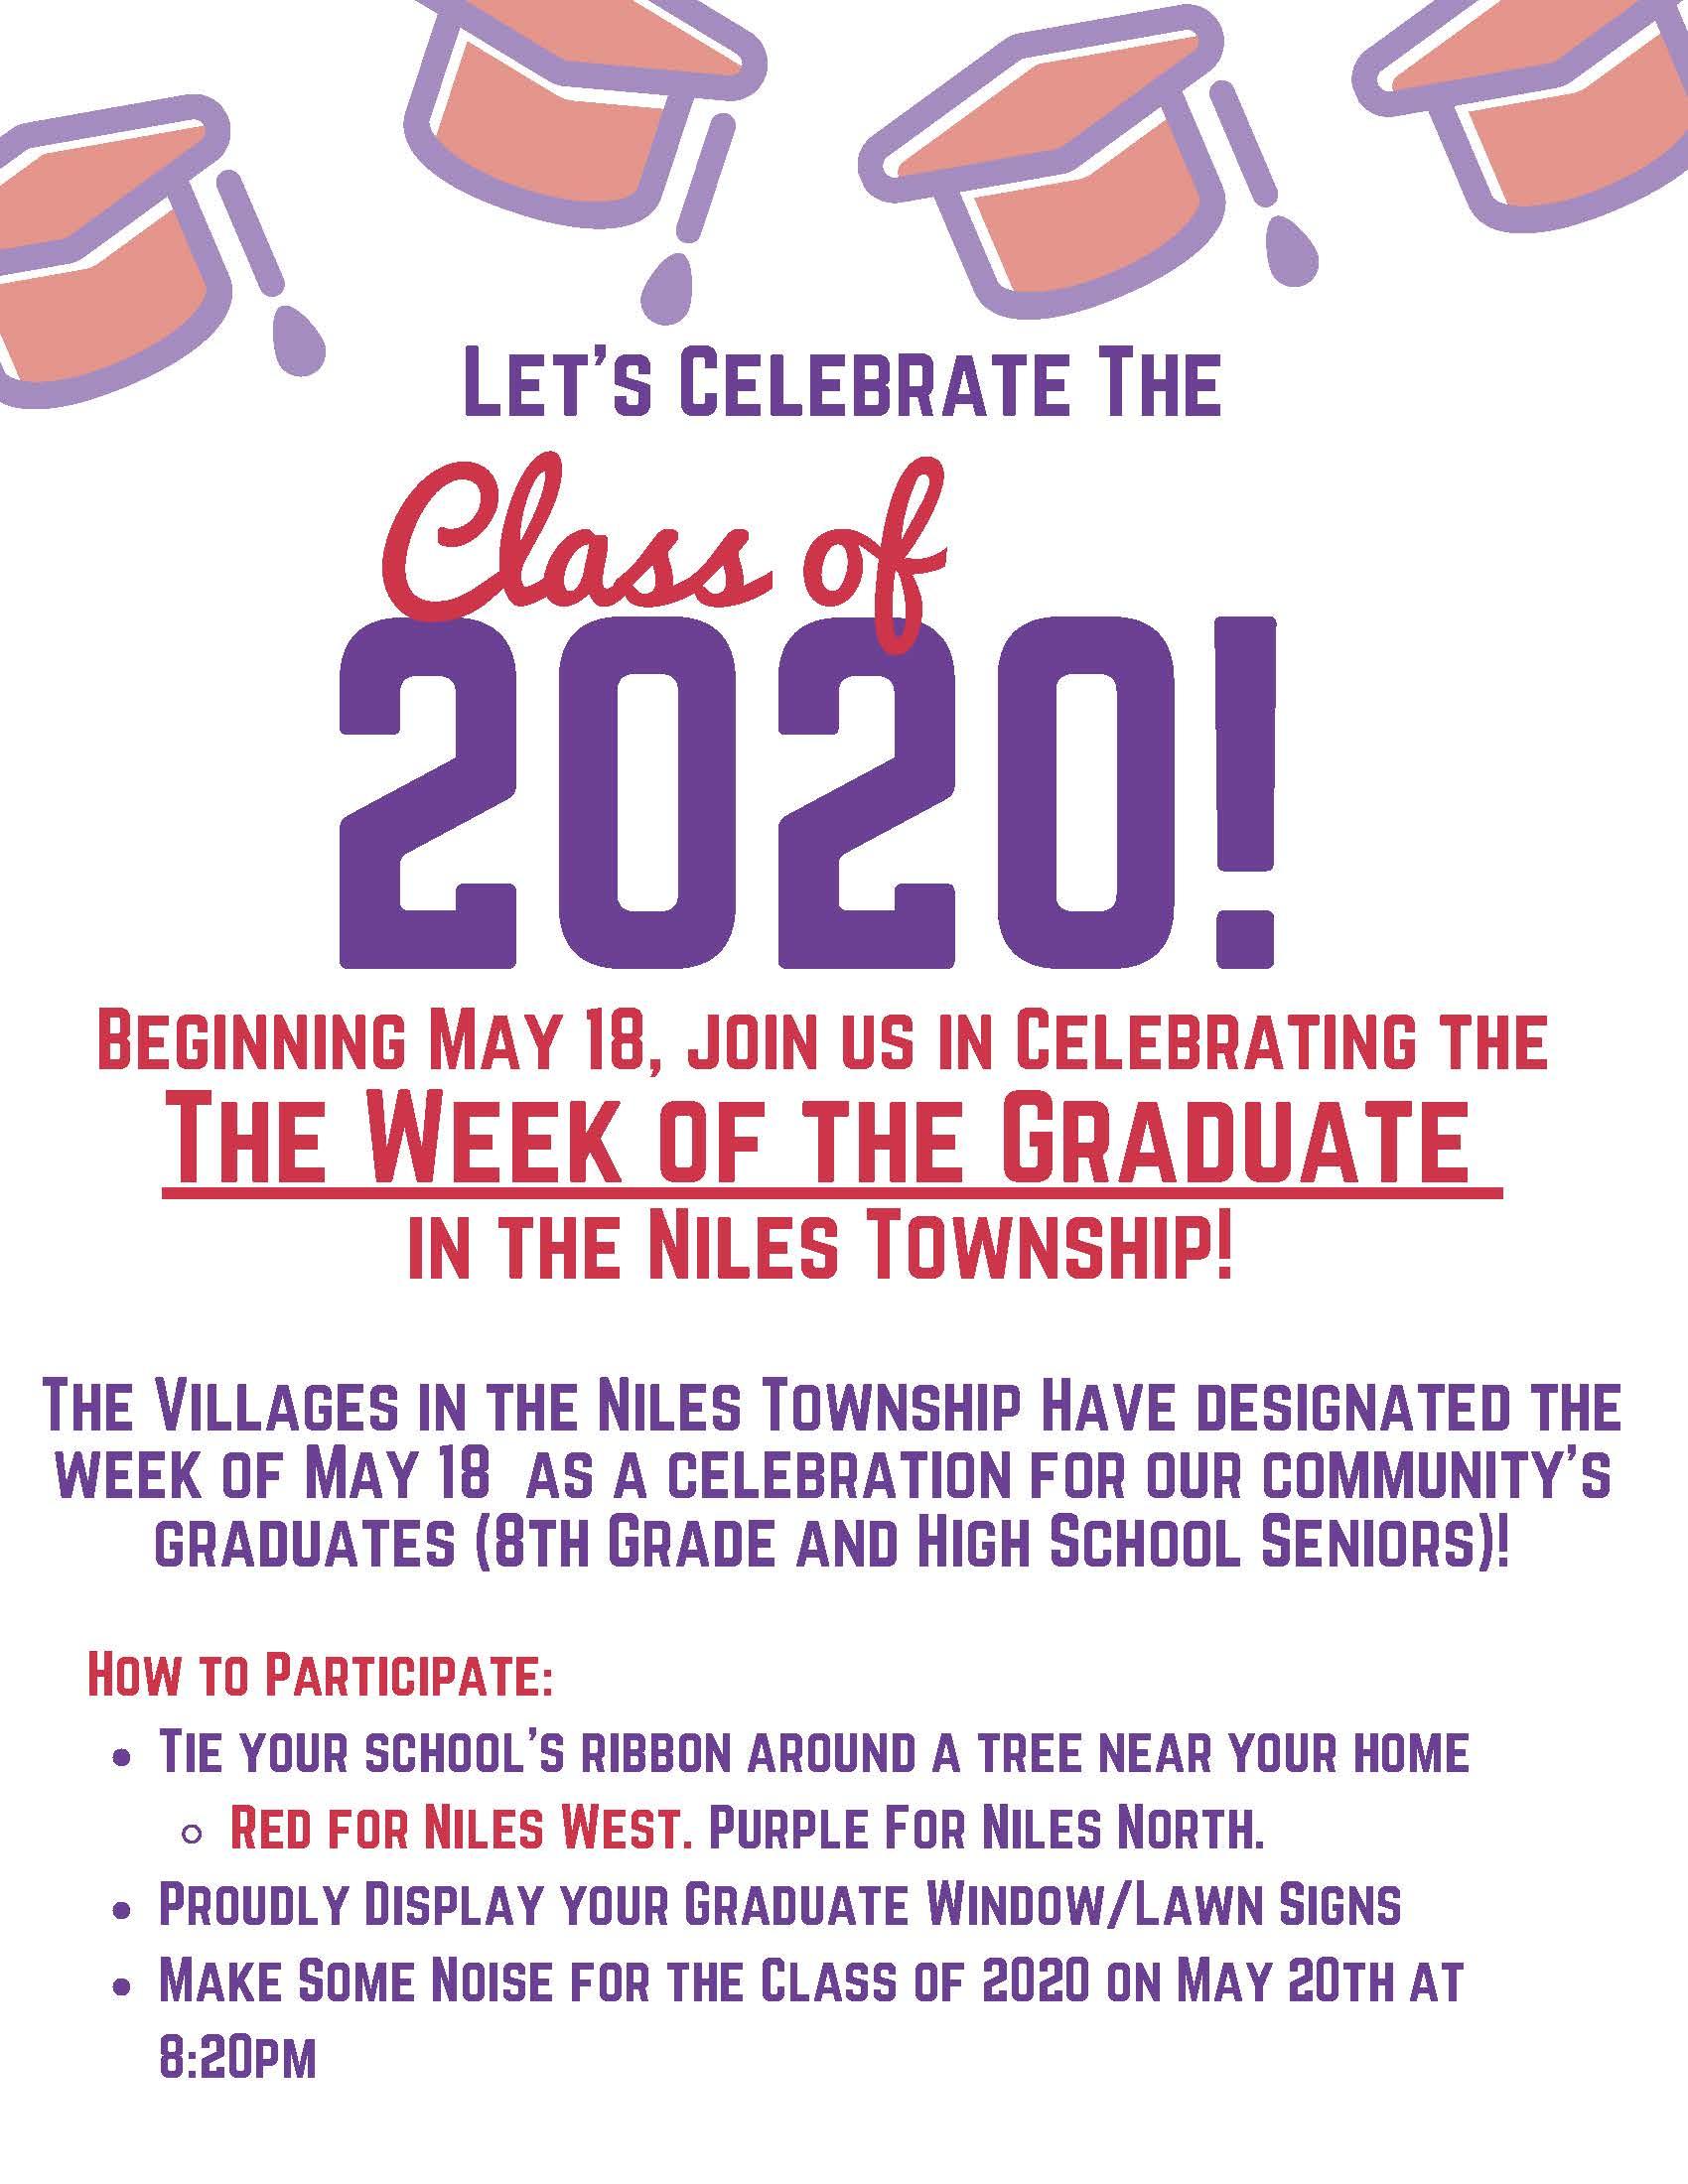 Week of the Graduate Flyer